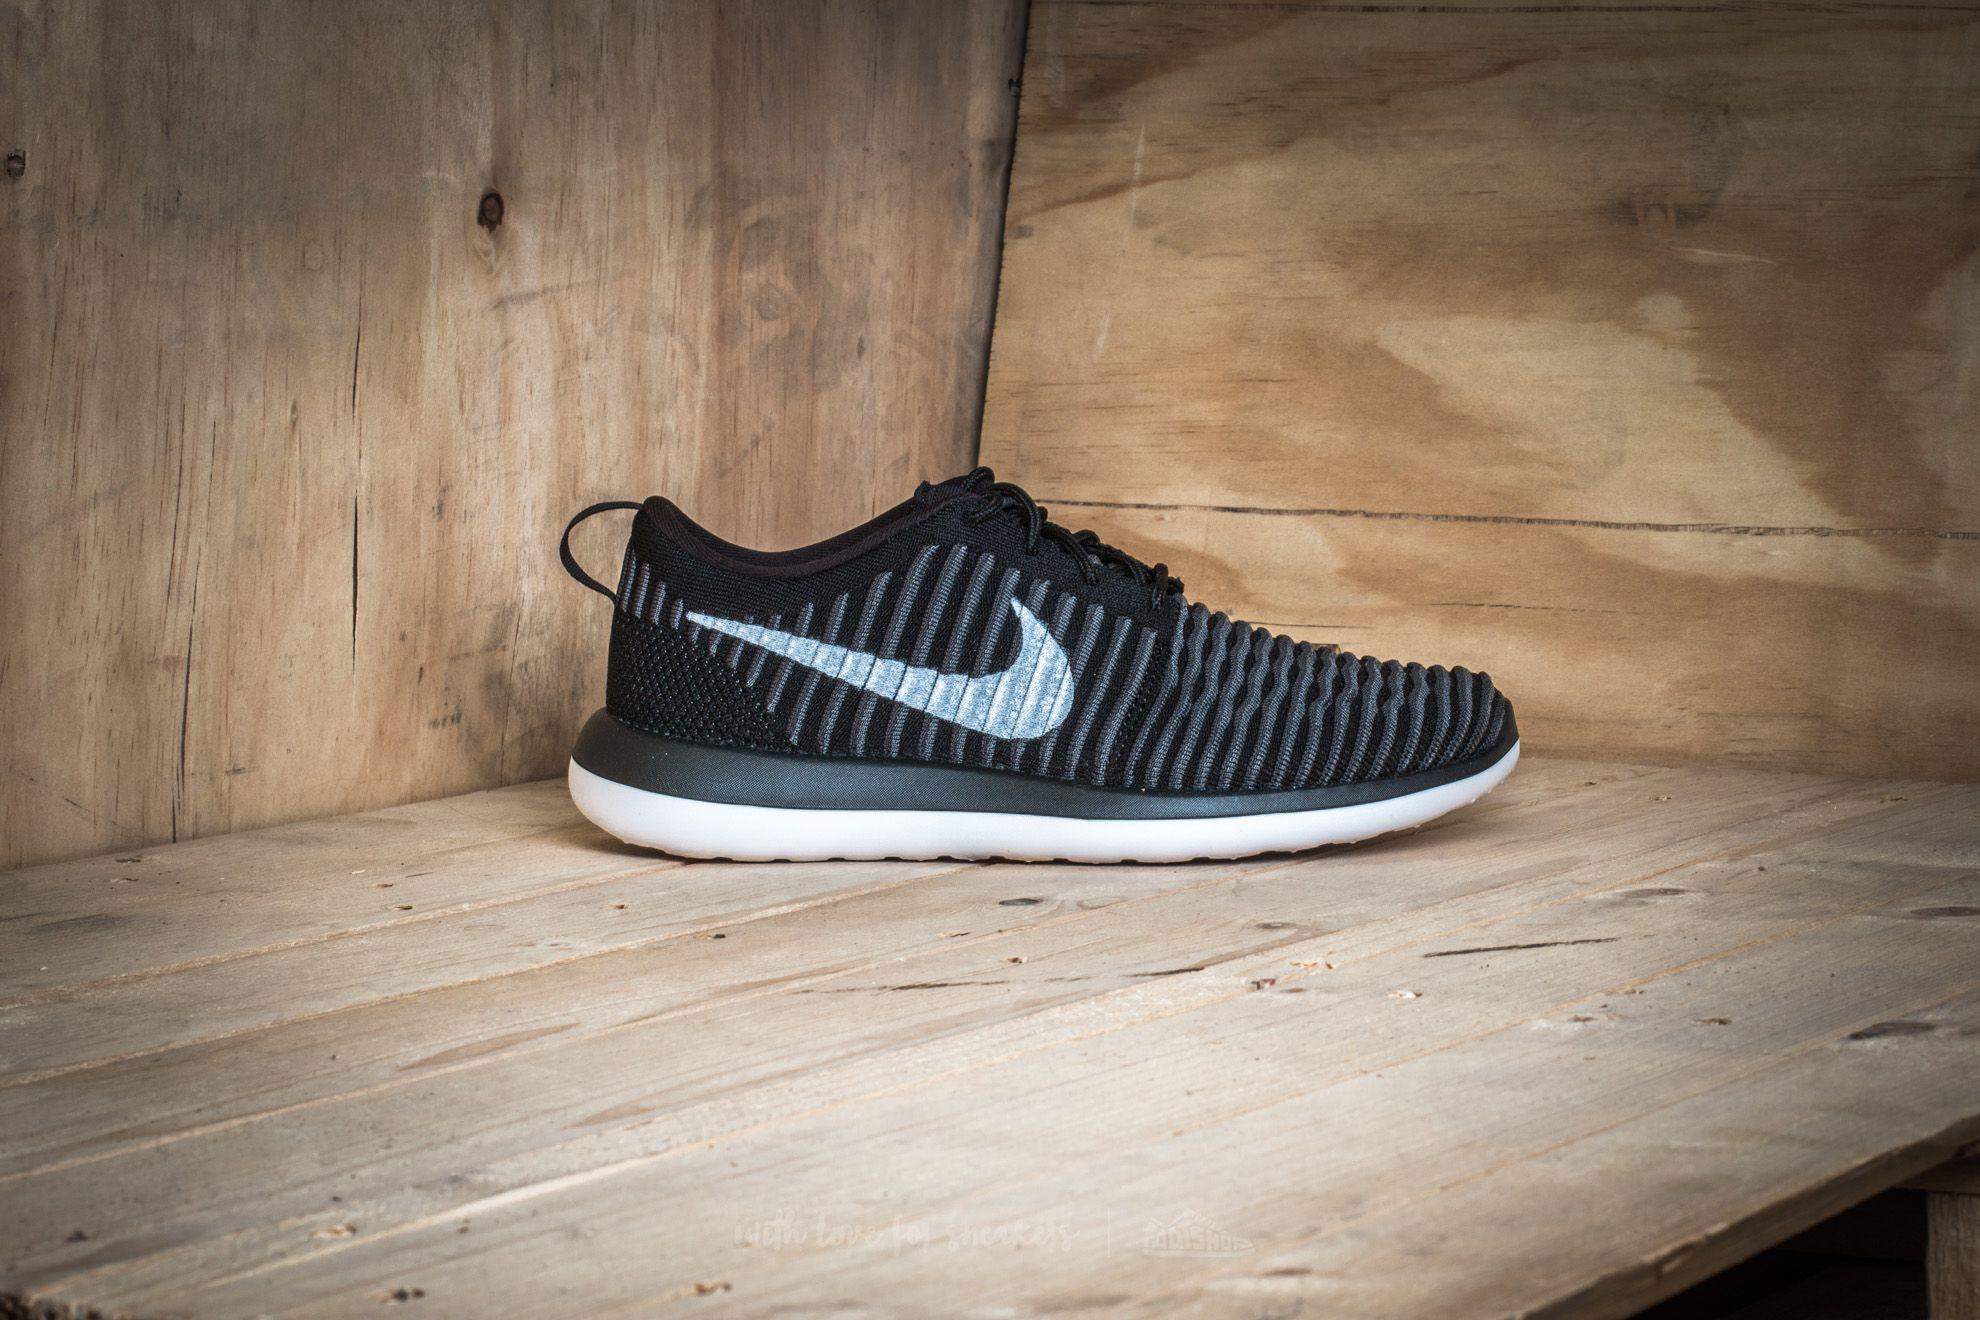 sports shoes 16745 6c4e5 Lyst - Nike Roshe Two Flyknit (gs) Black White-anthracite-da